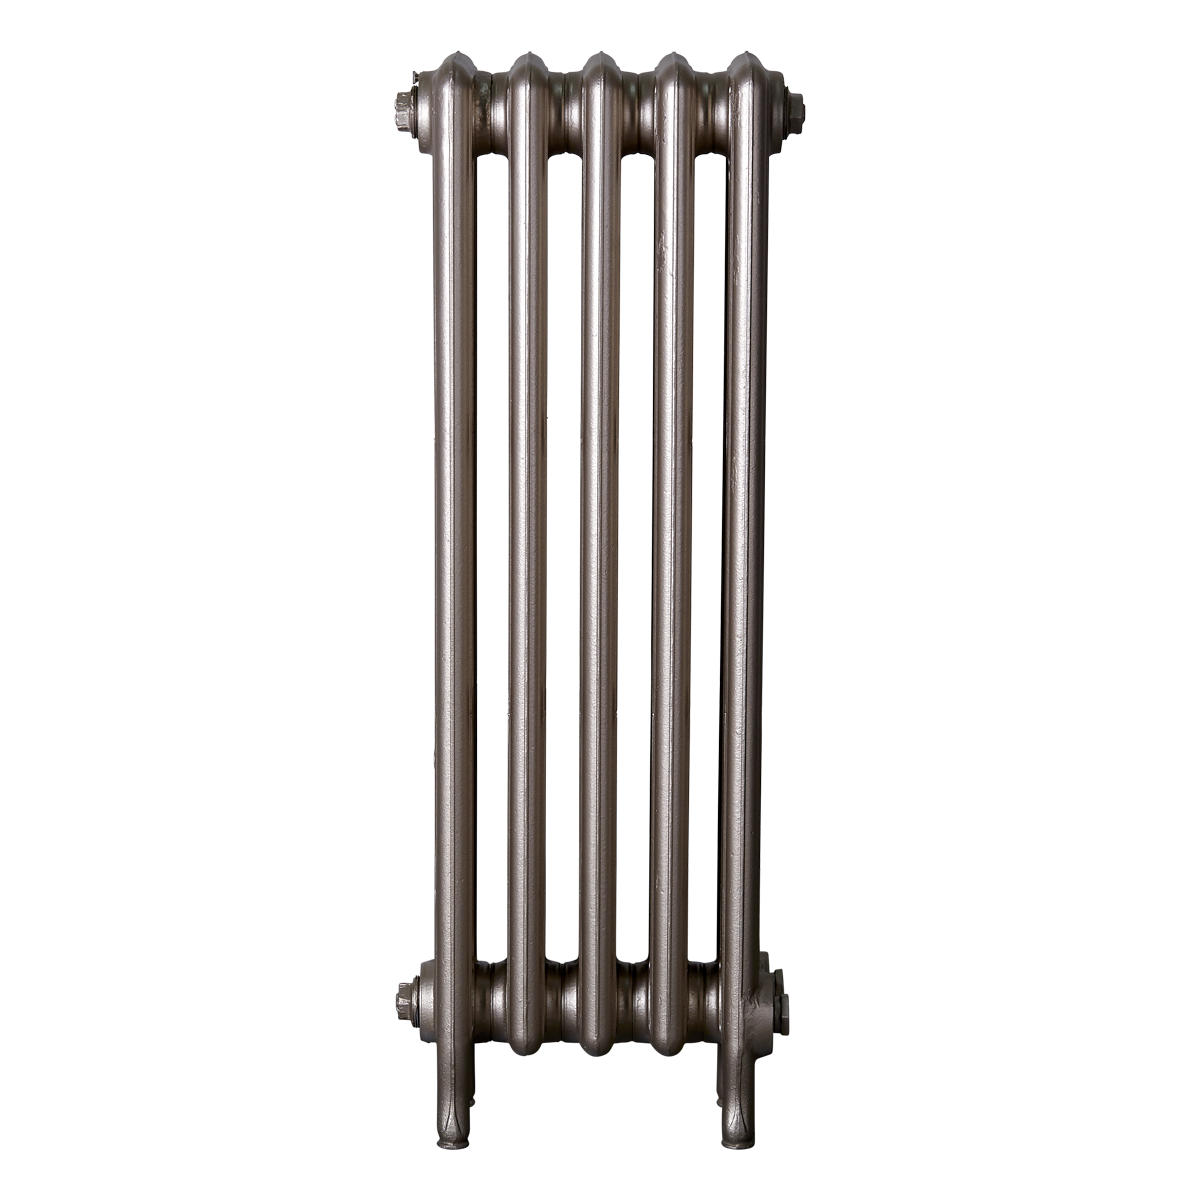 Ironworks Radiators Inc. refurbished cast iron radiator Gloucester in warm silver